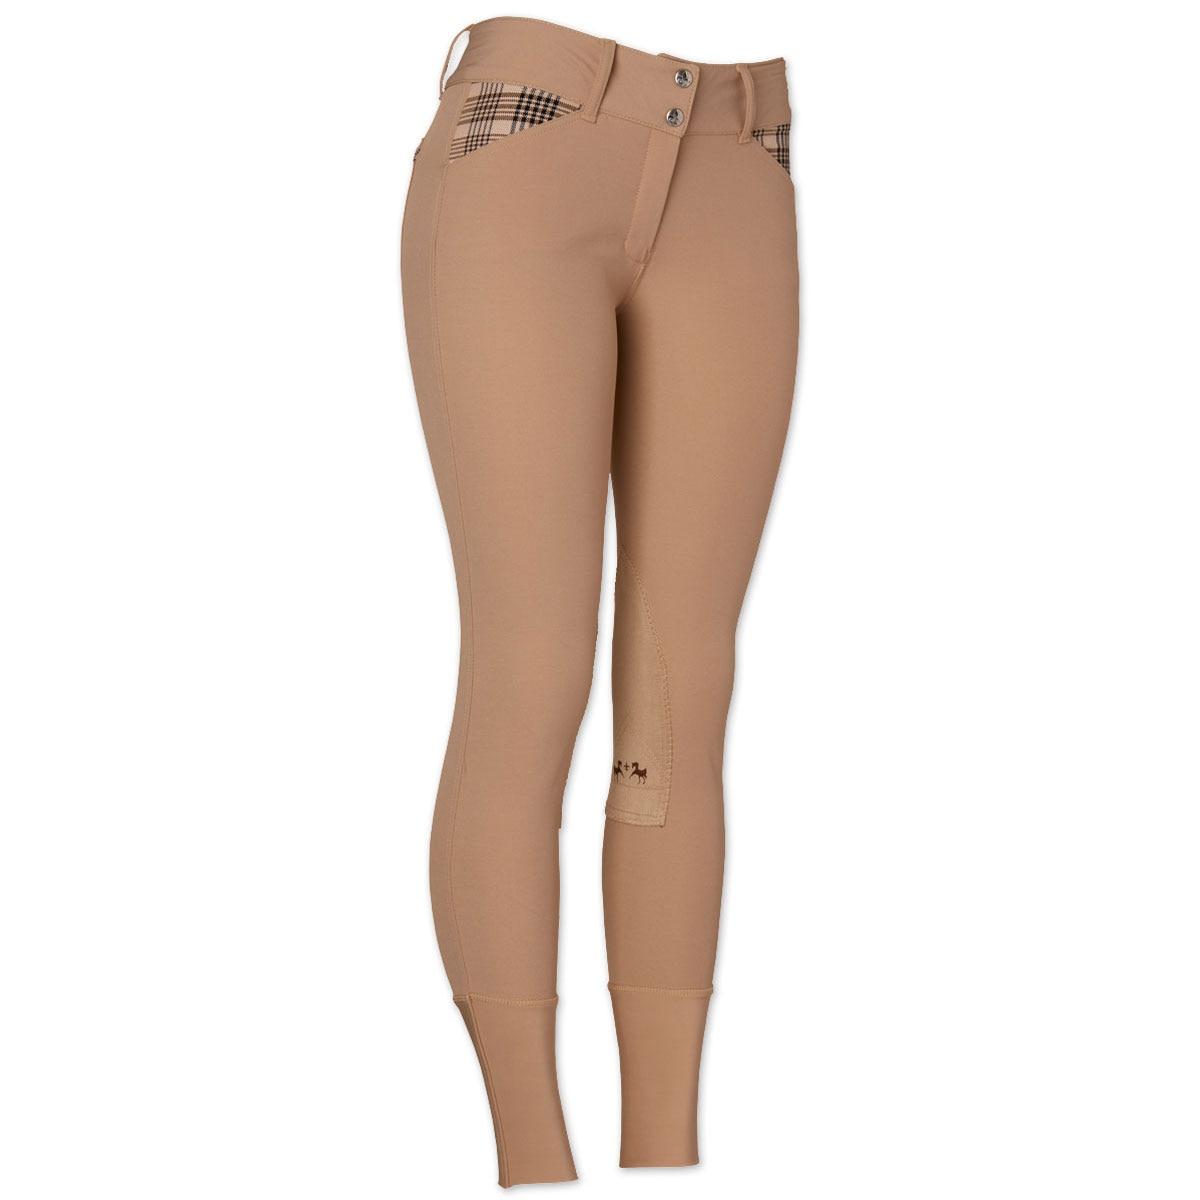 Baker™ Elite Knee Patch Breeches